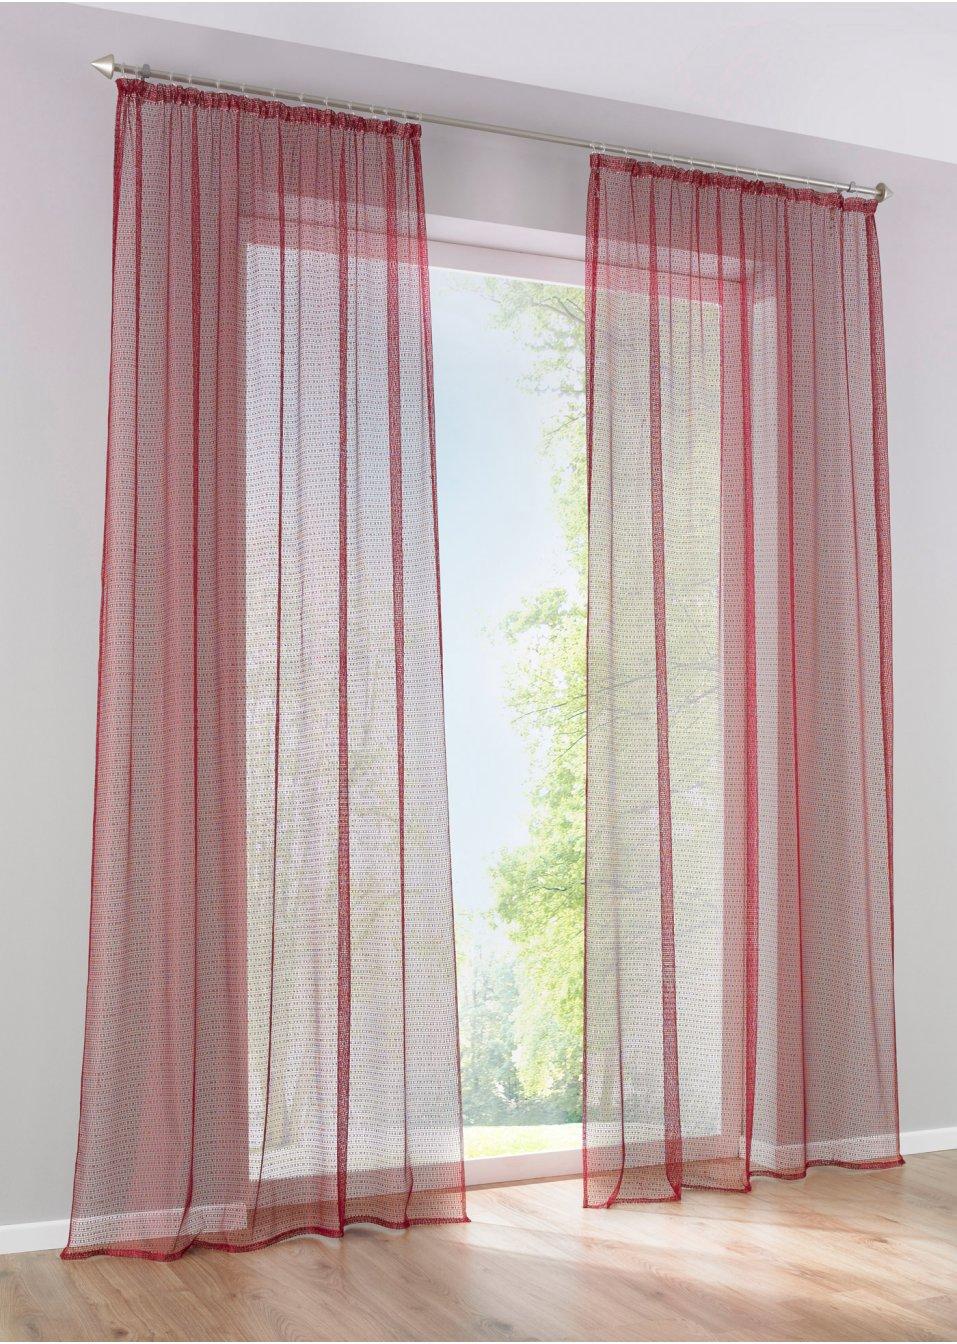 gardine nolan 1er pack schwarz bpc living online kaufen. Black Bedroom Furniture Sets. Home Design Ideas